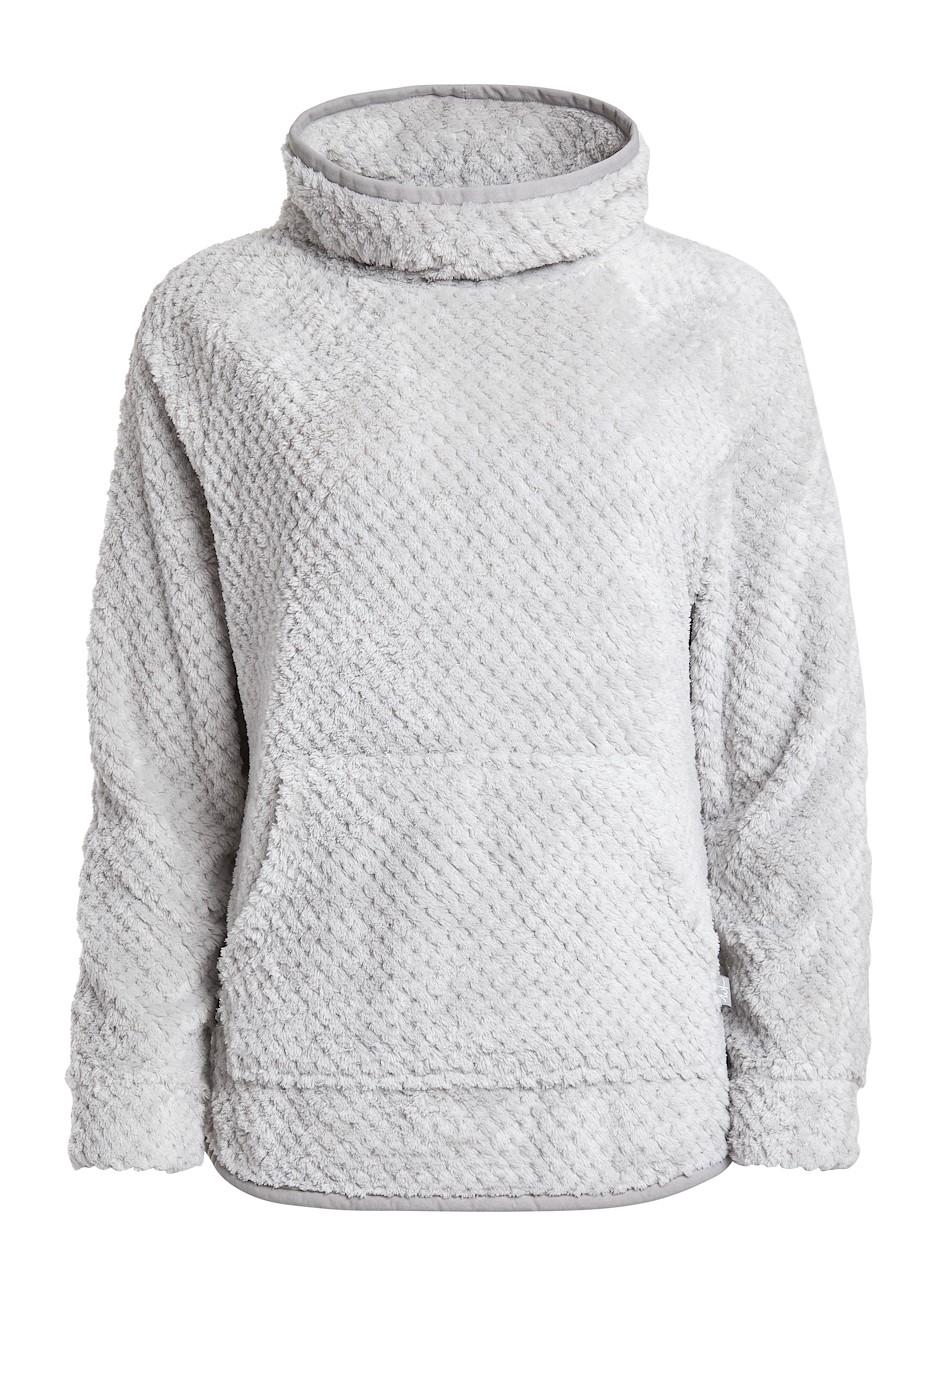 Stella Honeycomb Fur Fleece Pearl Grey